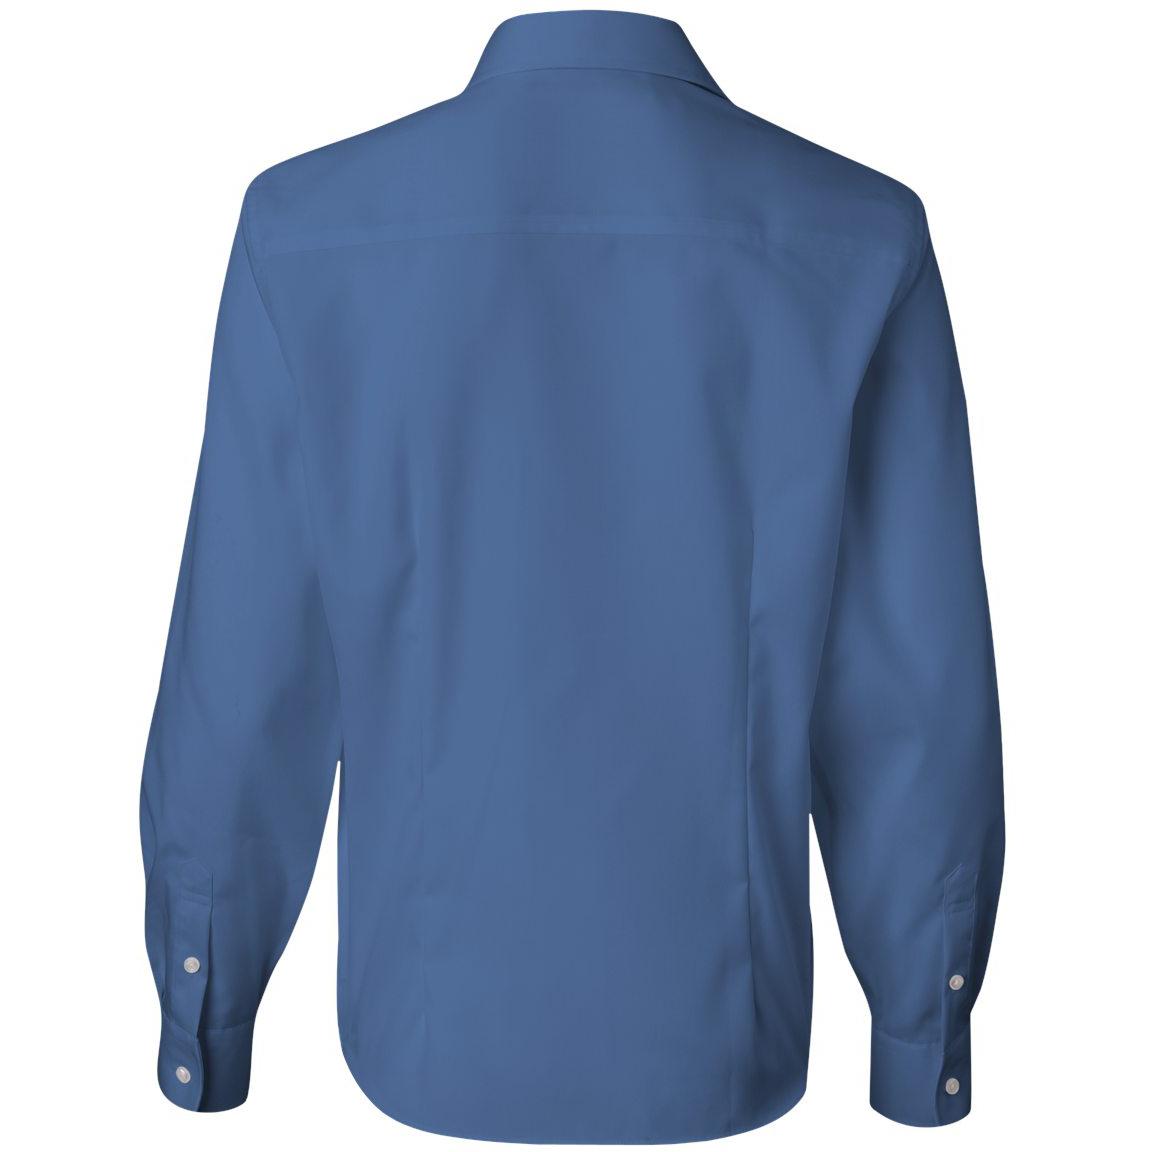 Van heusen 13v0144 women 39 s non iron pinpoint oxford shirt for French blue oxford shirt